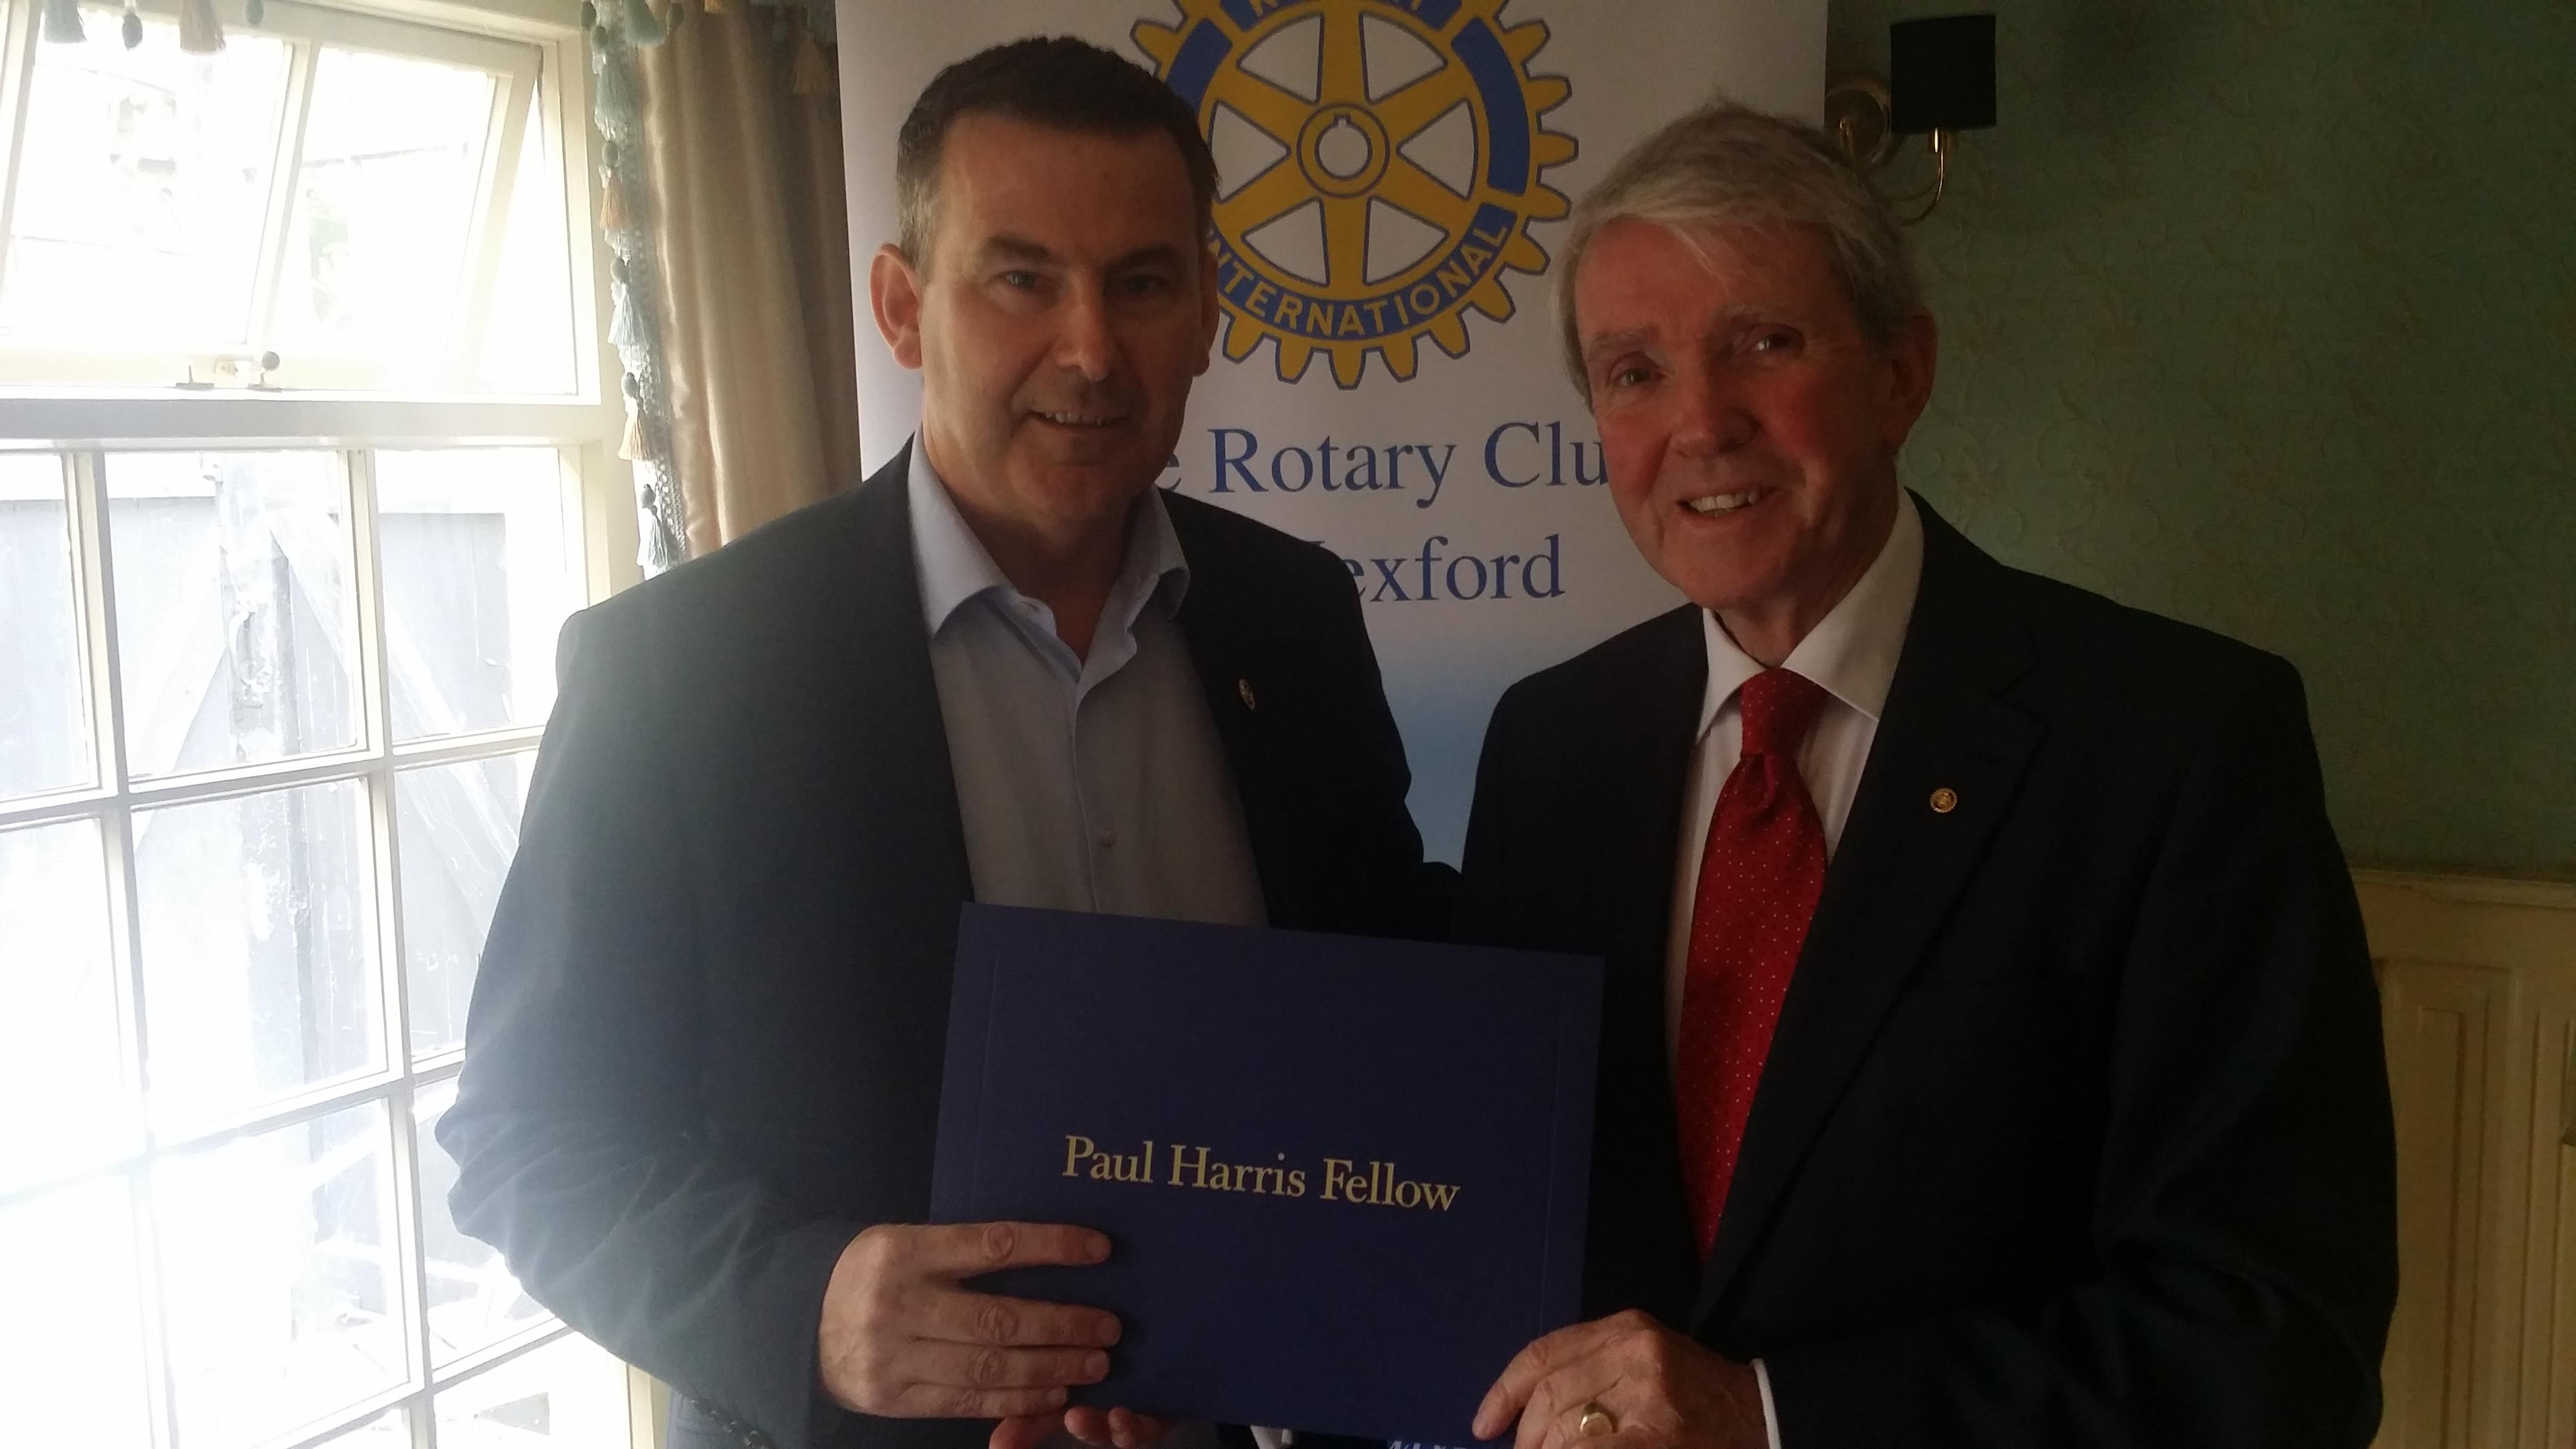 Liam Dwyer receiving Paul Harris fellowship from Eddie Breen, President Wexford Rotary Club